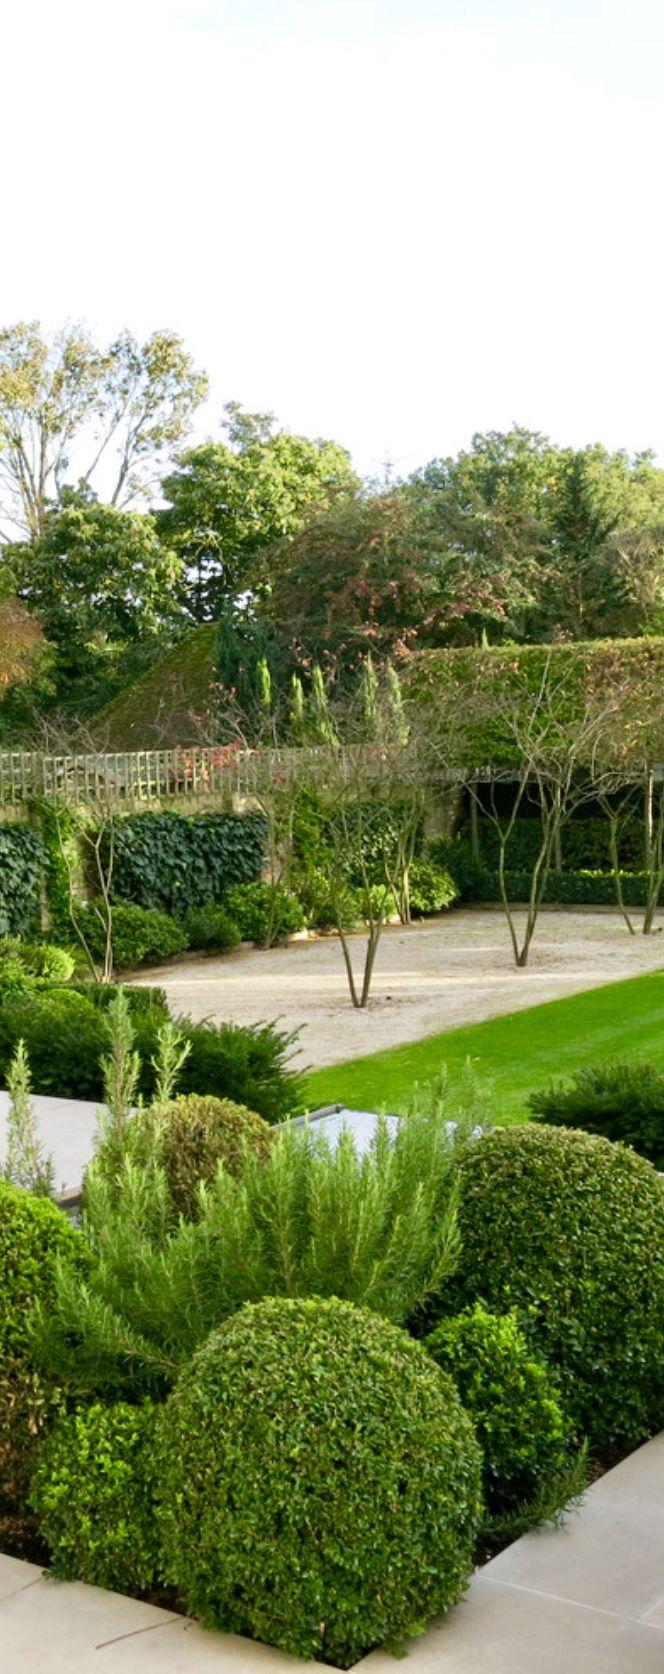 461 best Garden images on Pinterest